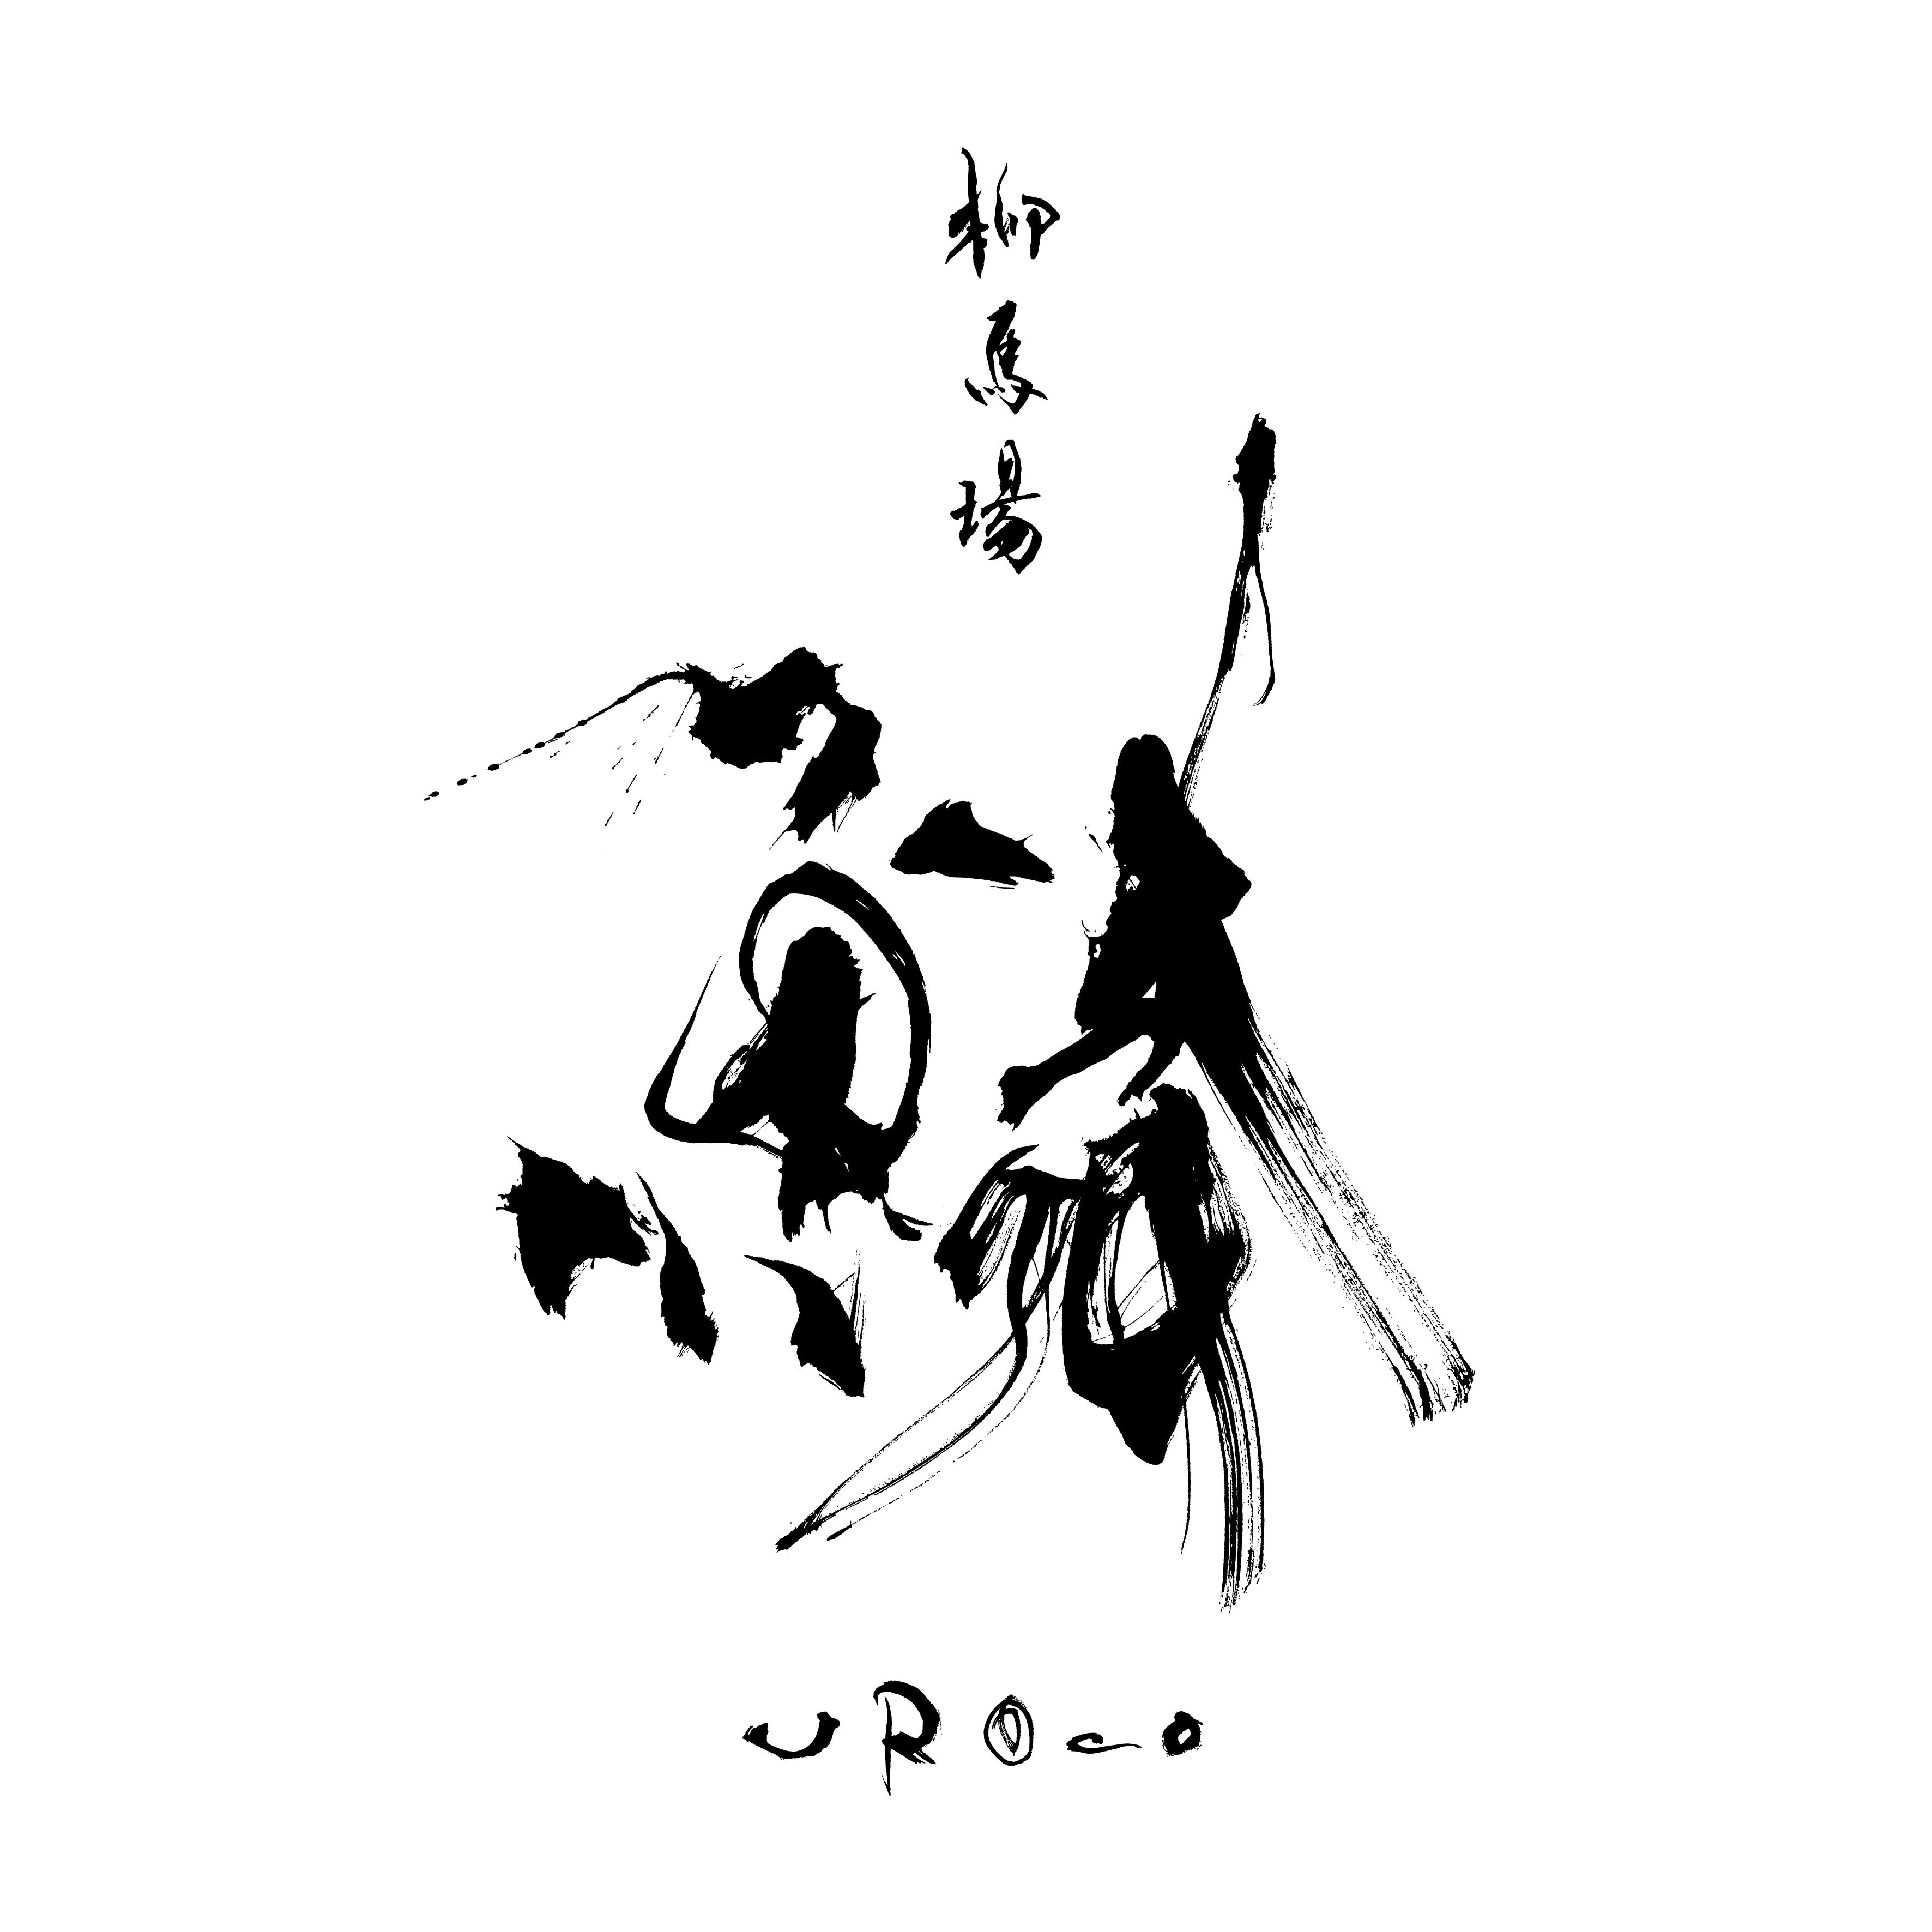 柳馬場 鱗 -UROCO-